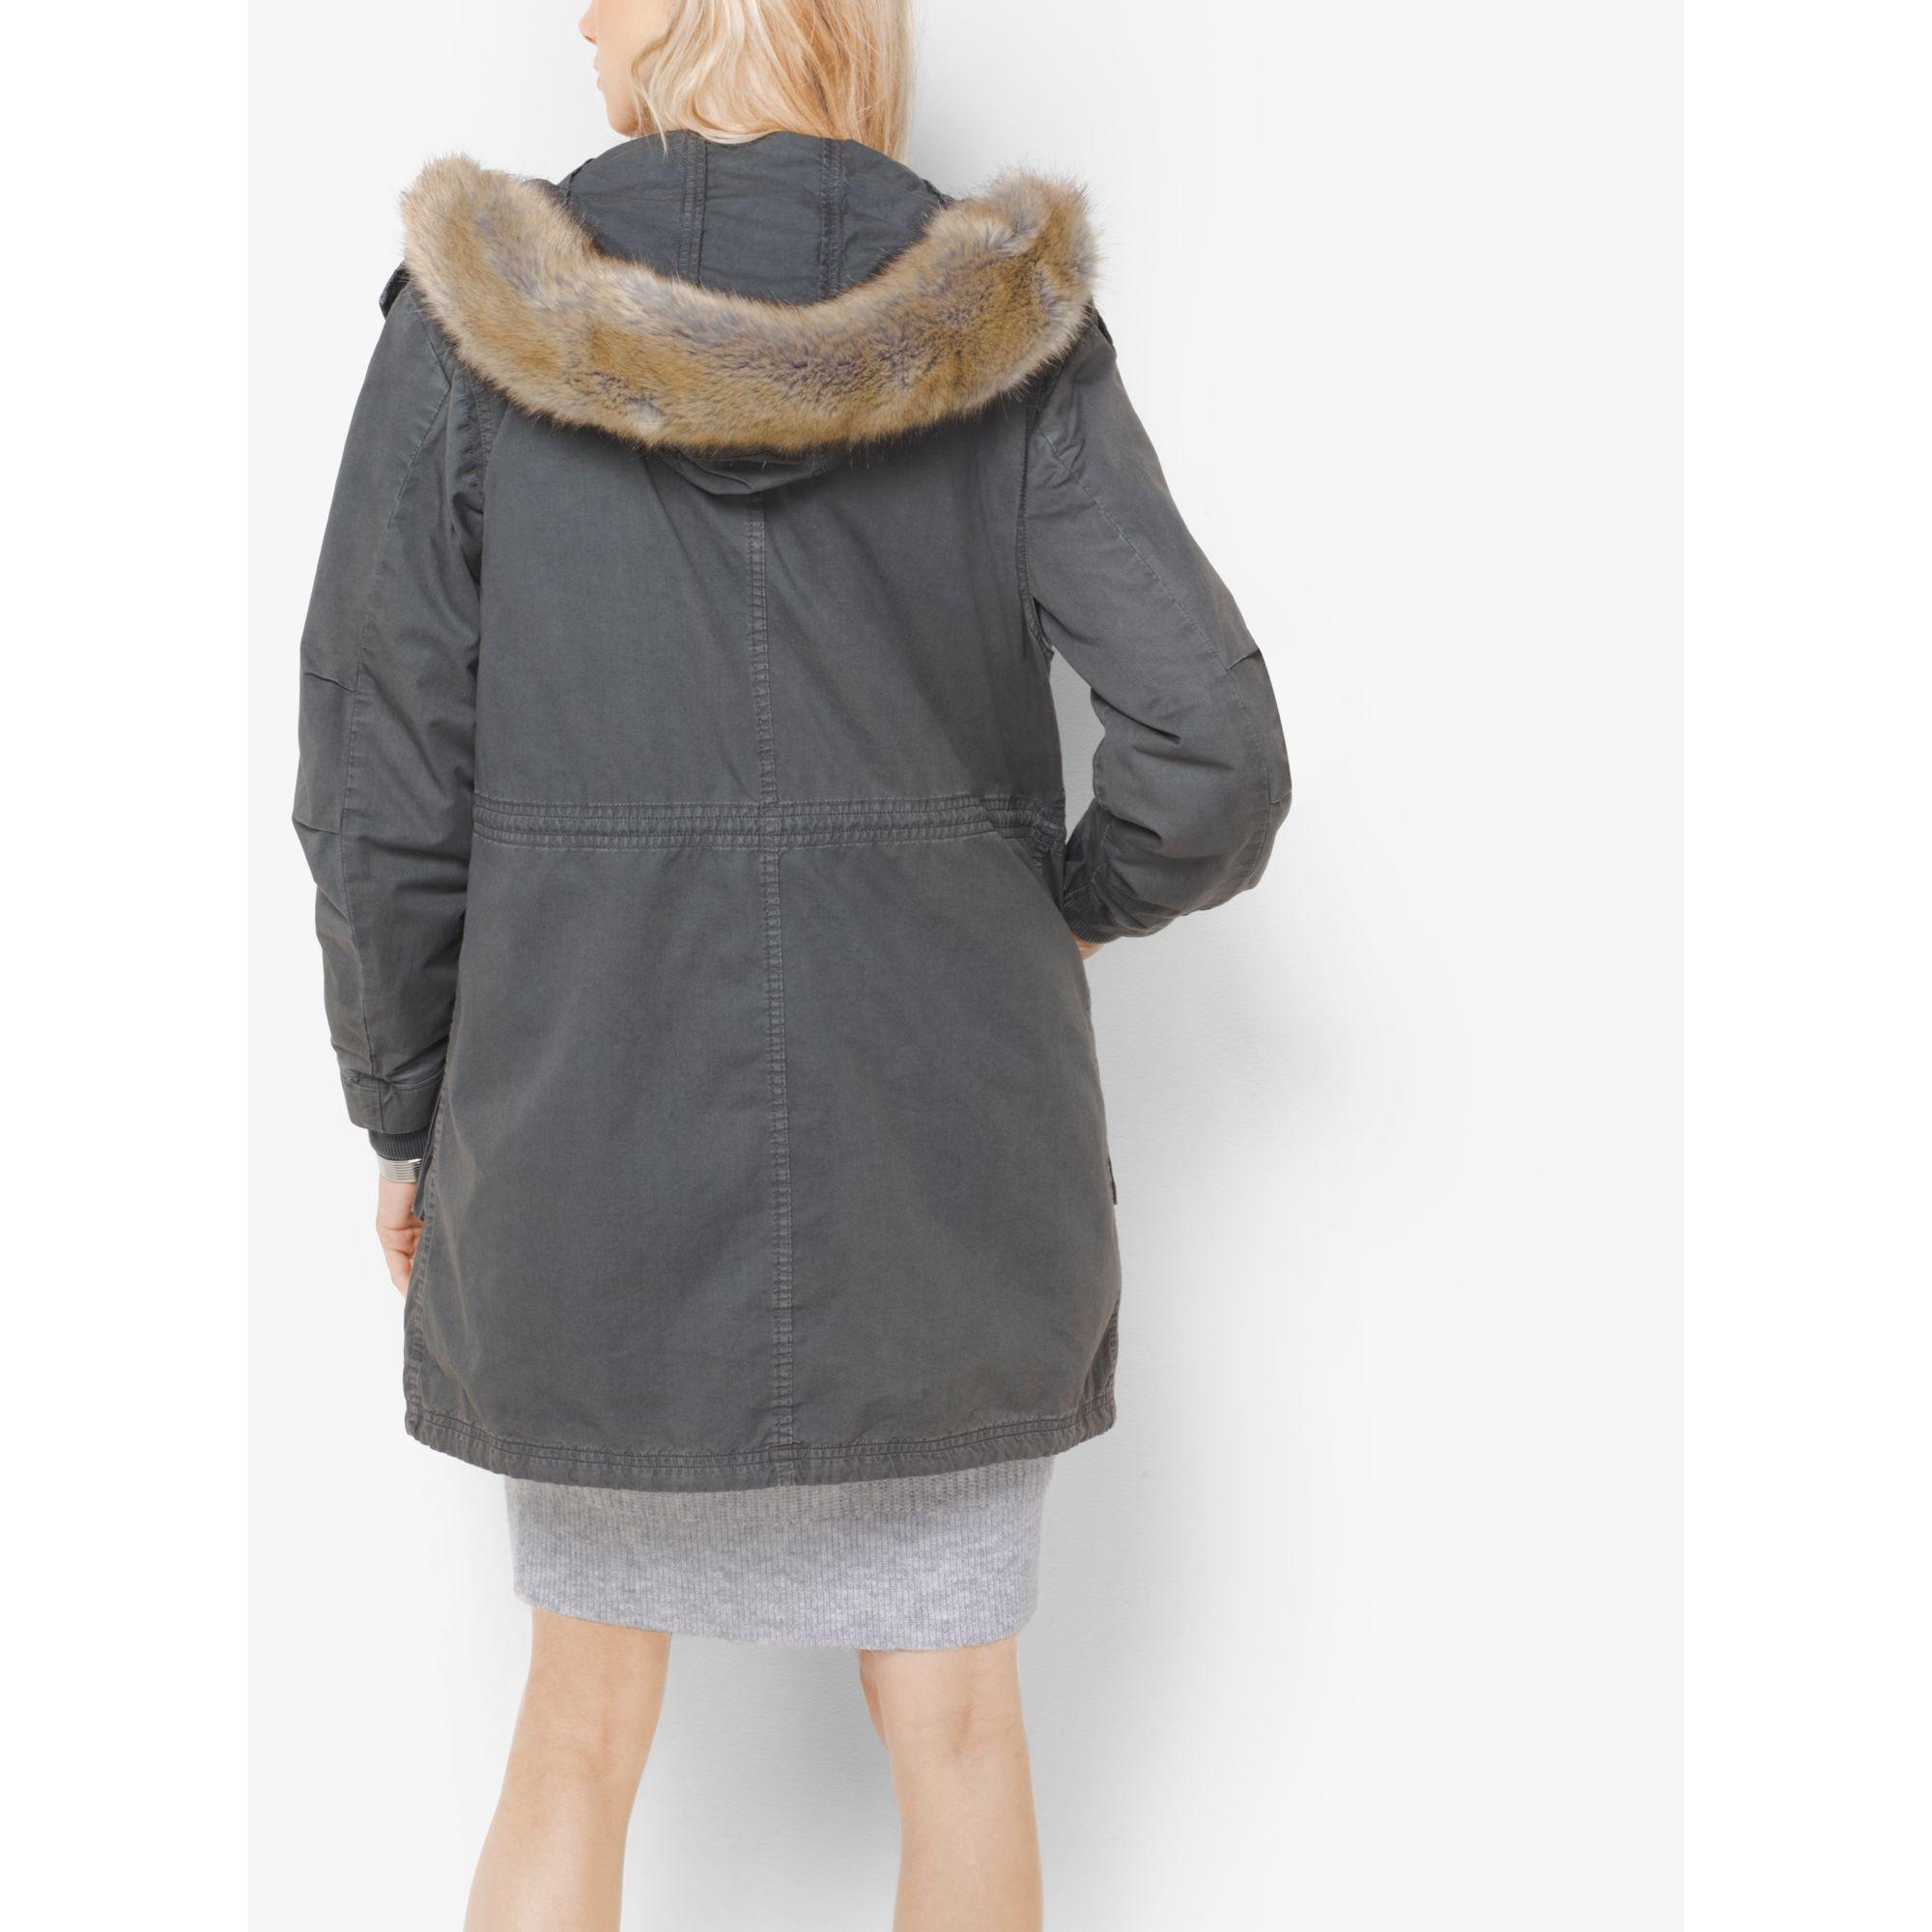 Twill fleece lined parka